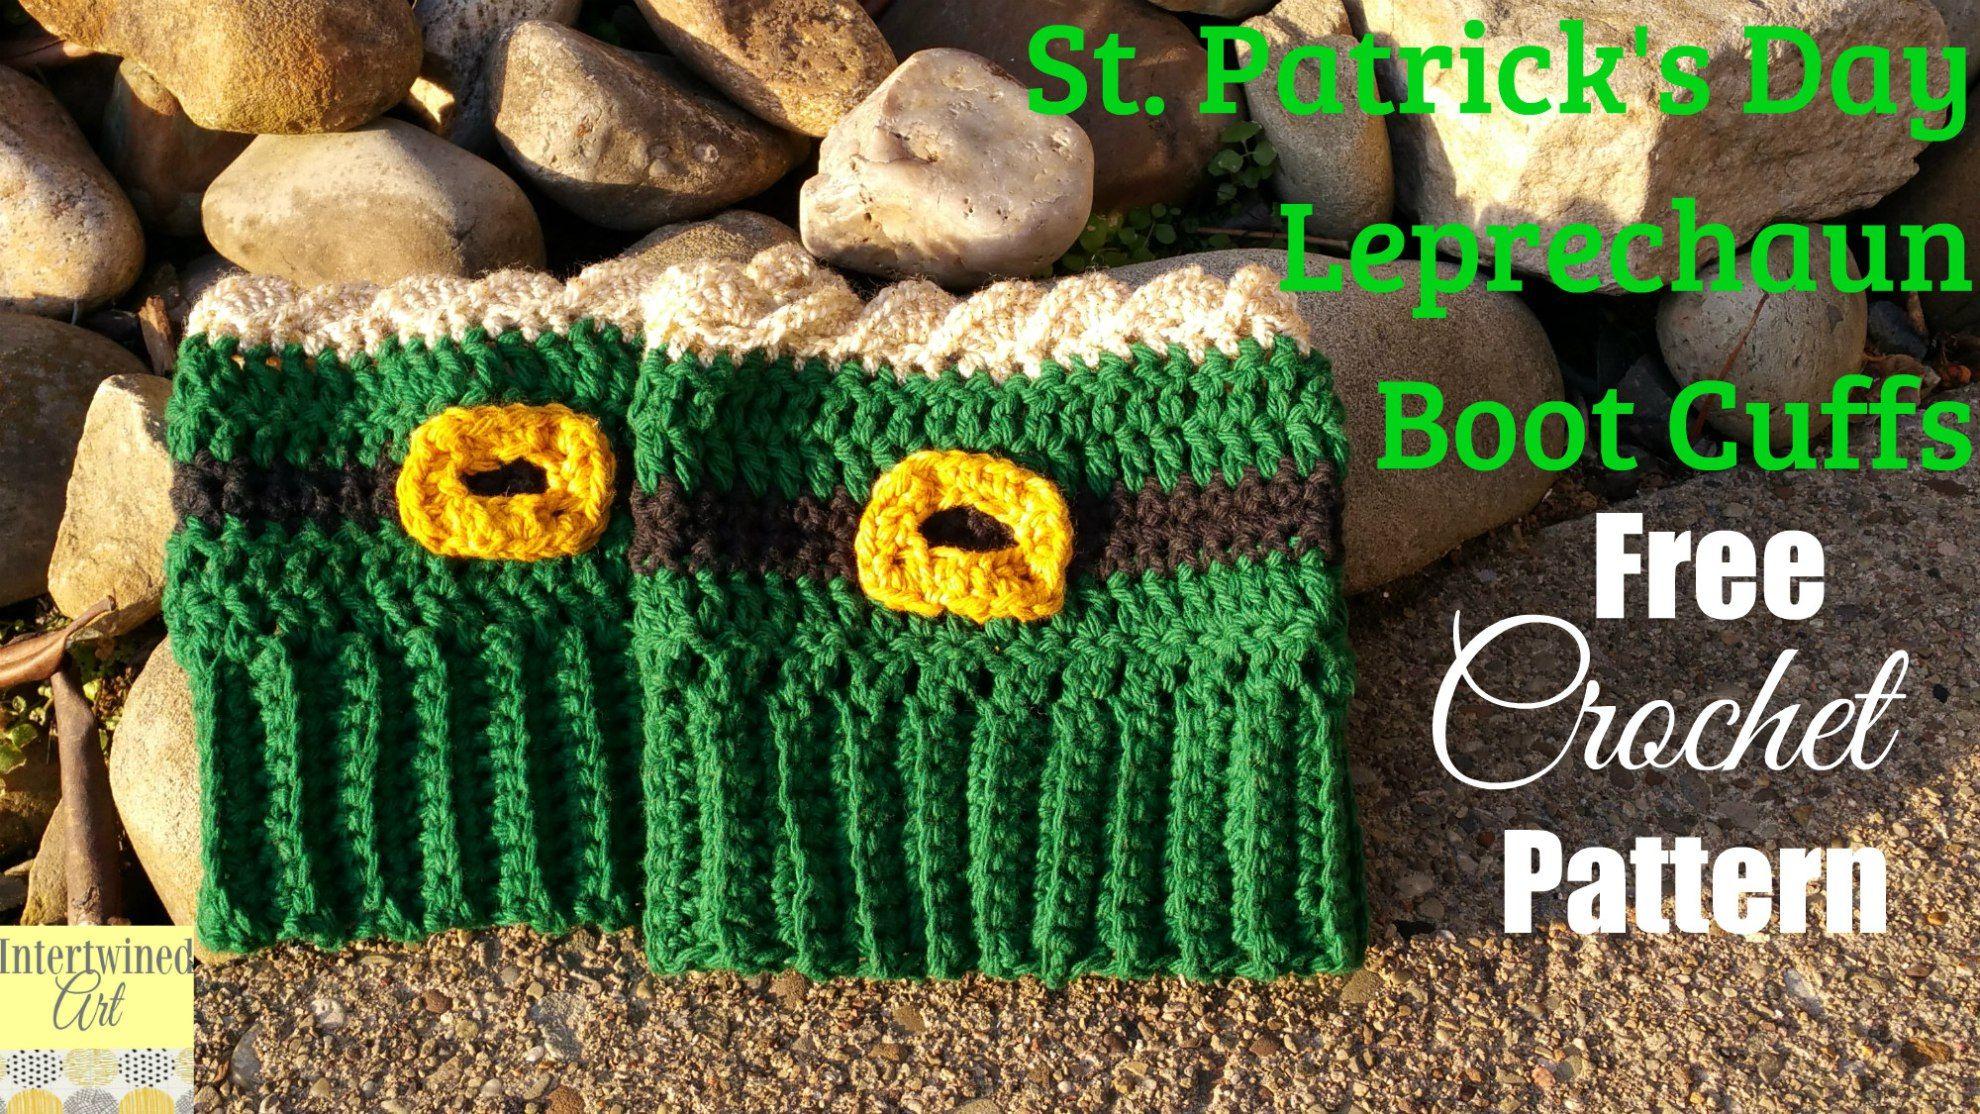 Free Amigurumi Leprechaun Pattern : St. patrick's day leprechaun crochet boot cuffs crochet boot cuffs